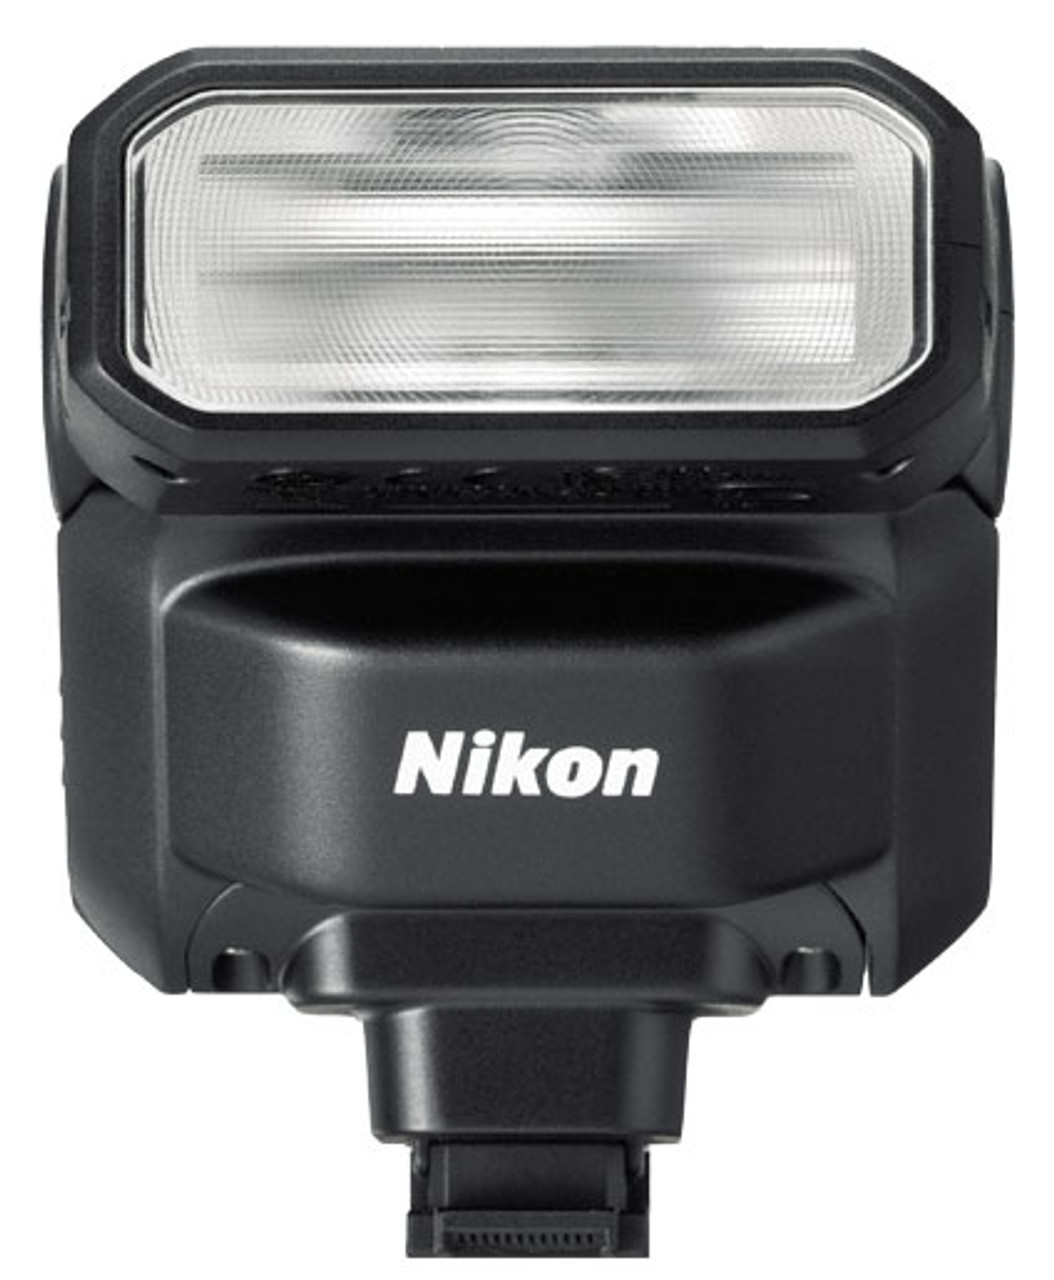 Nikon 1 SB-N7 Speedlight - Black